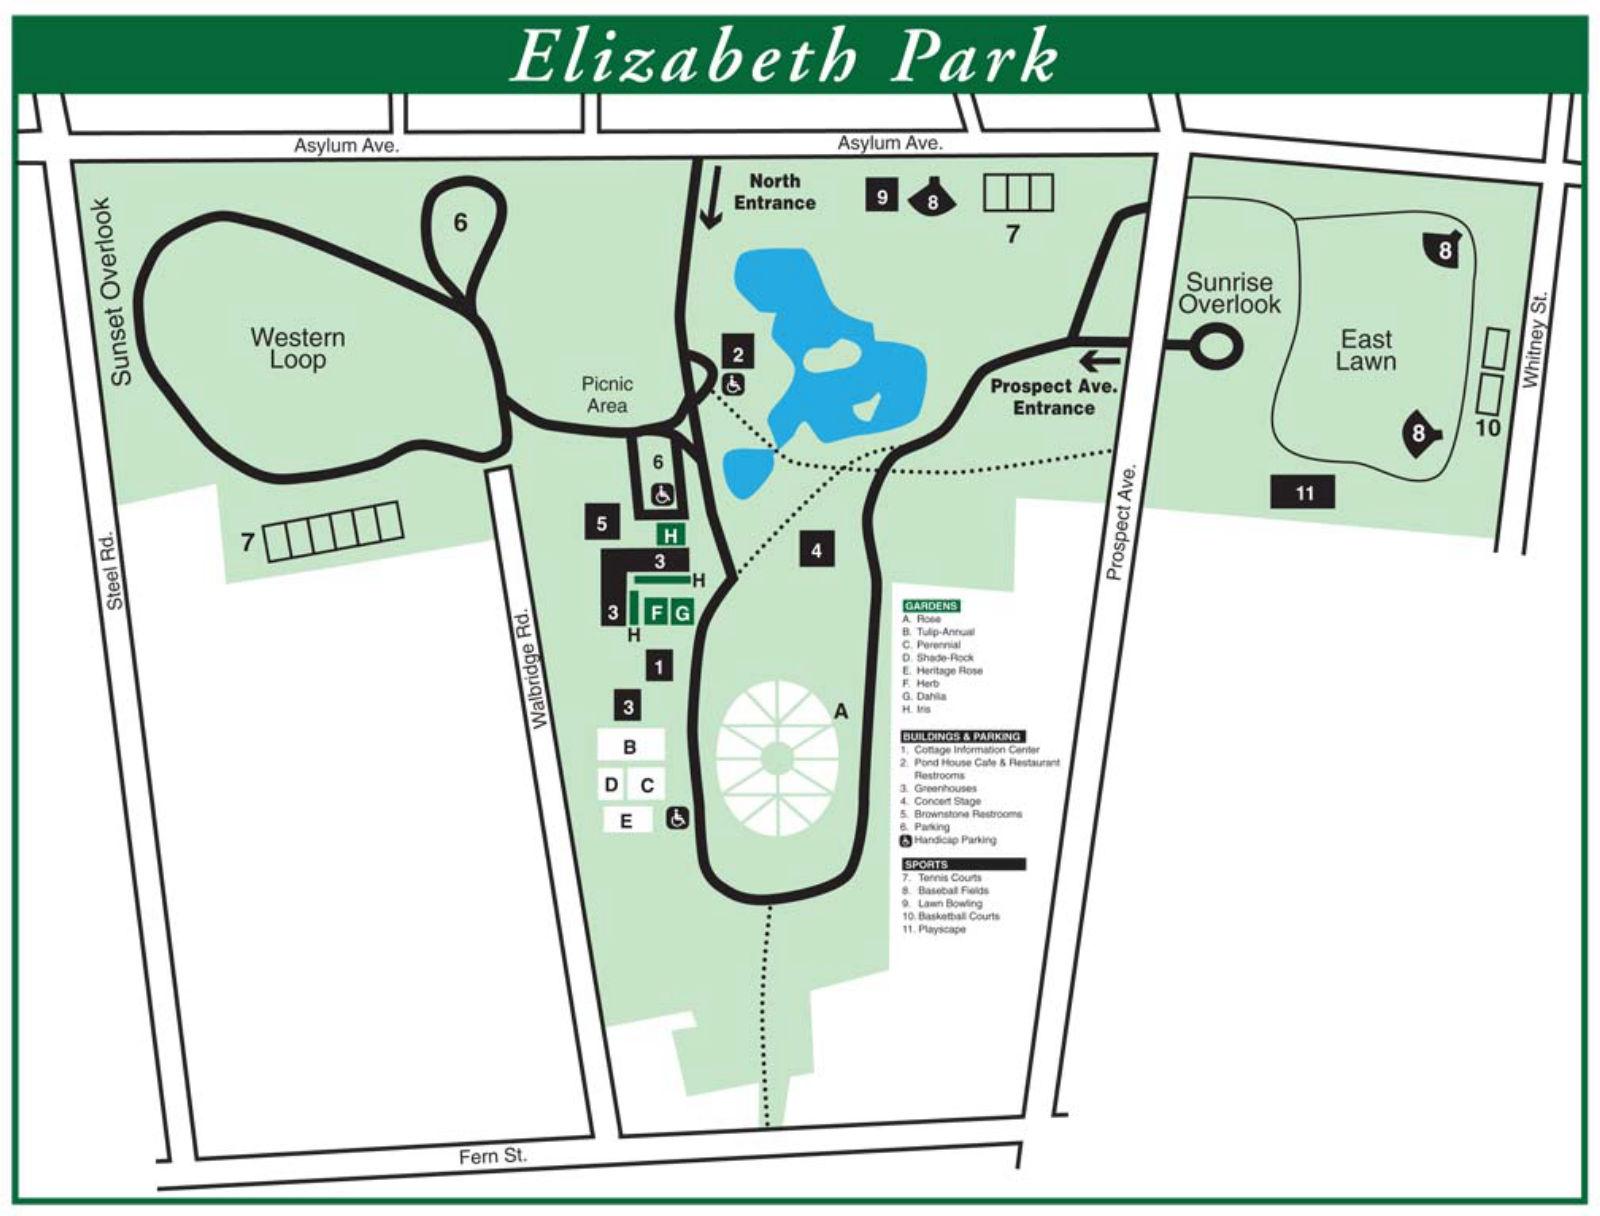 Directions and Parking - Elizabeth Park